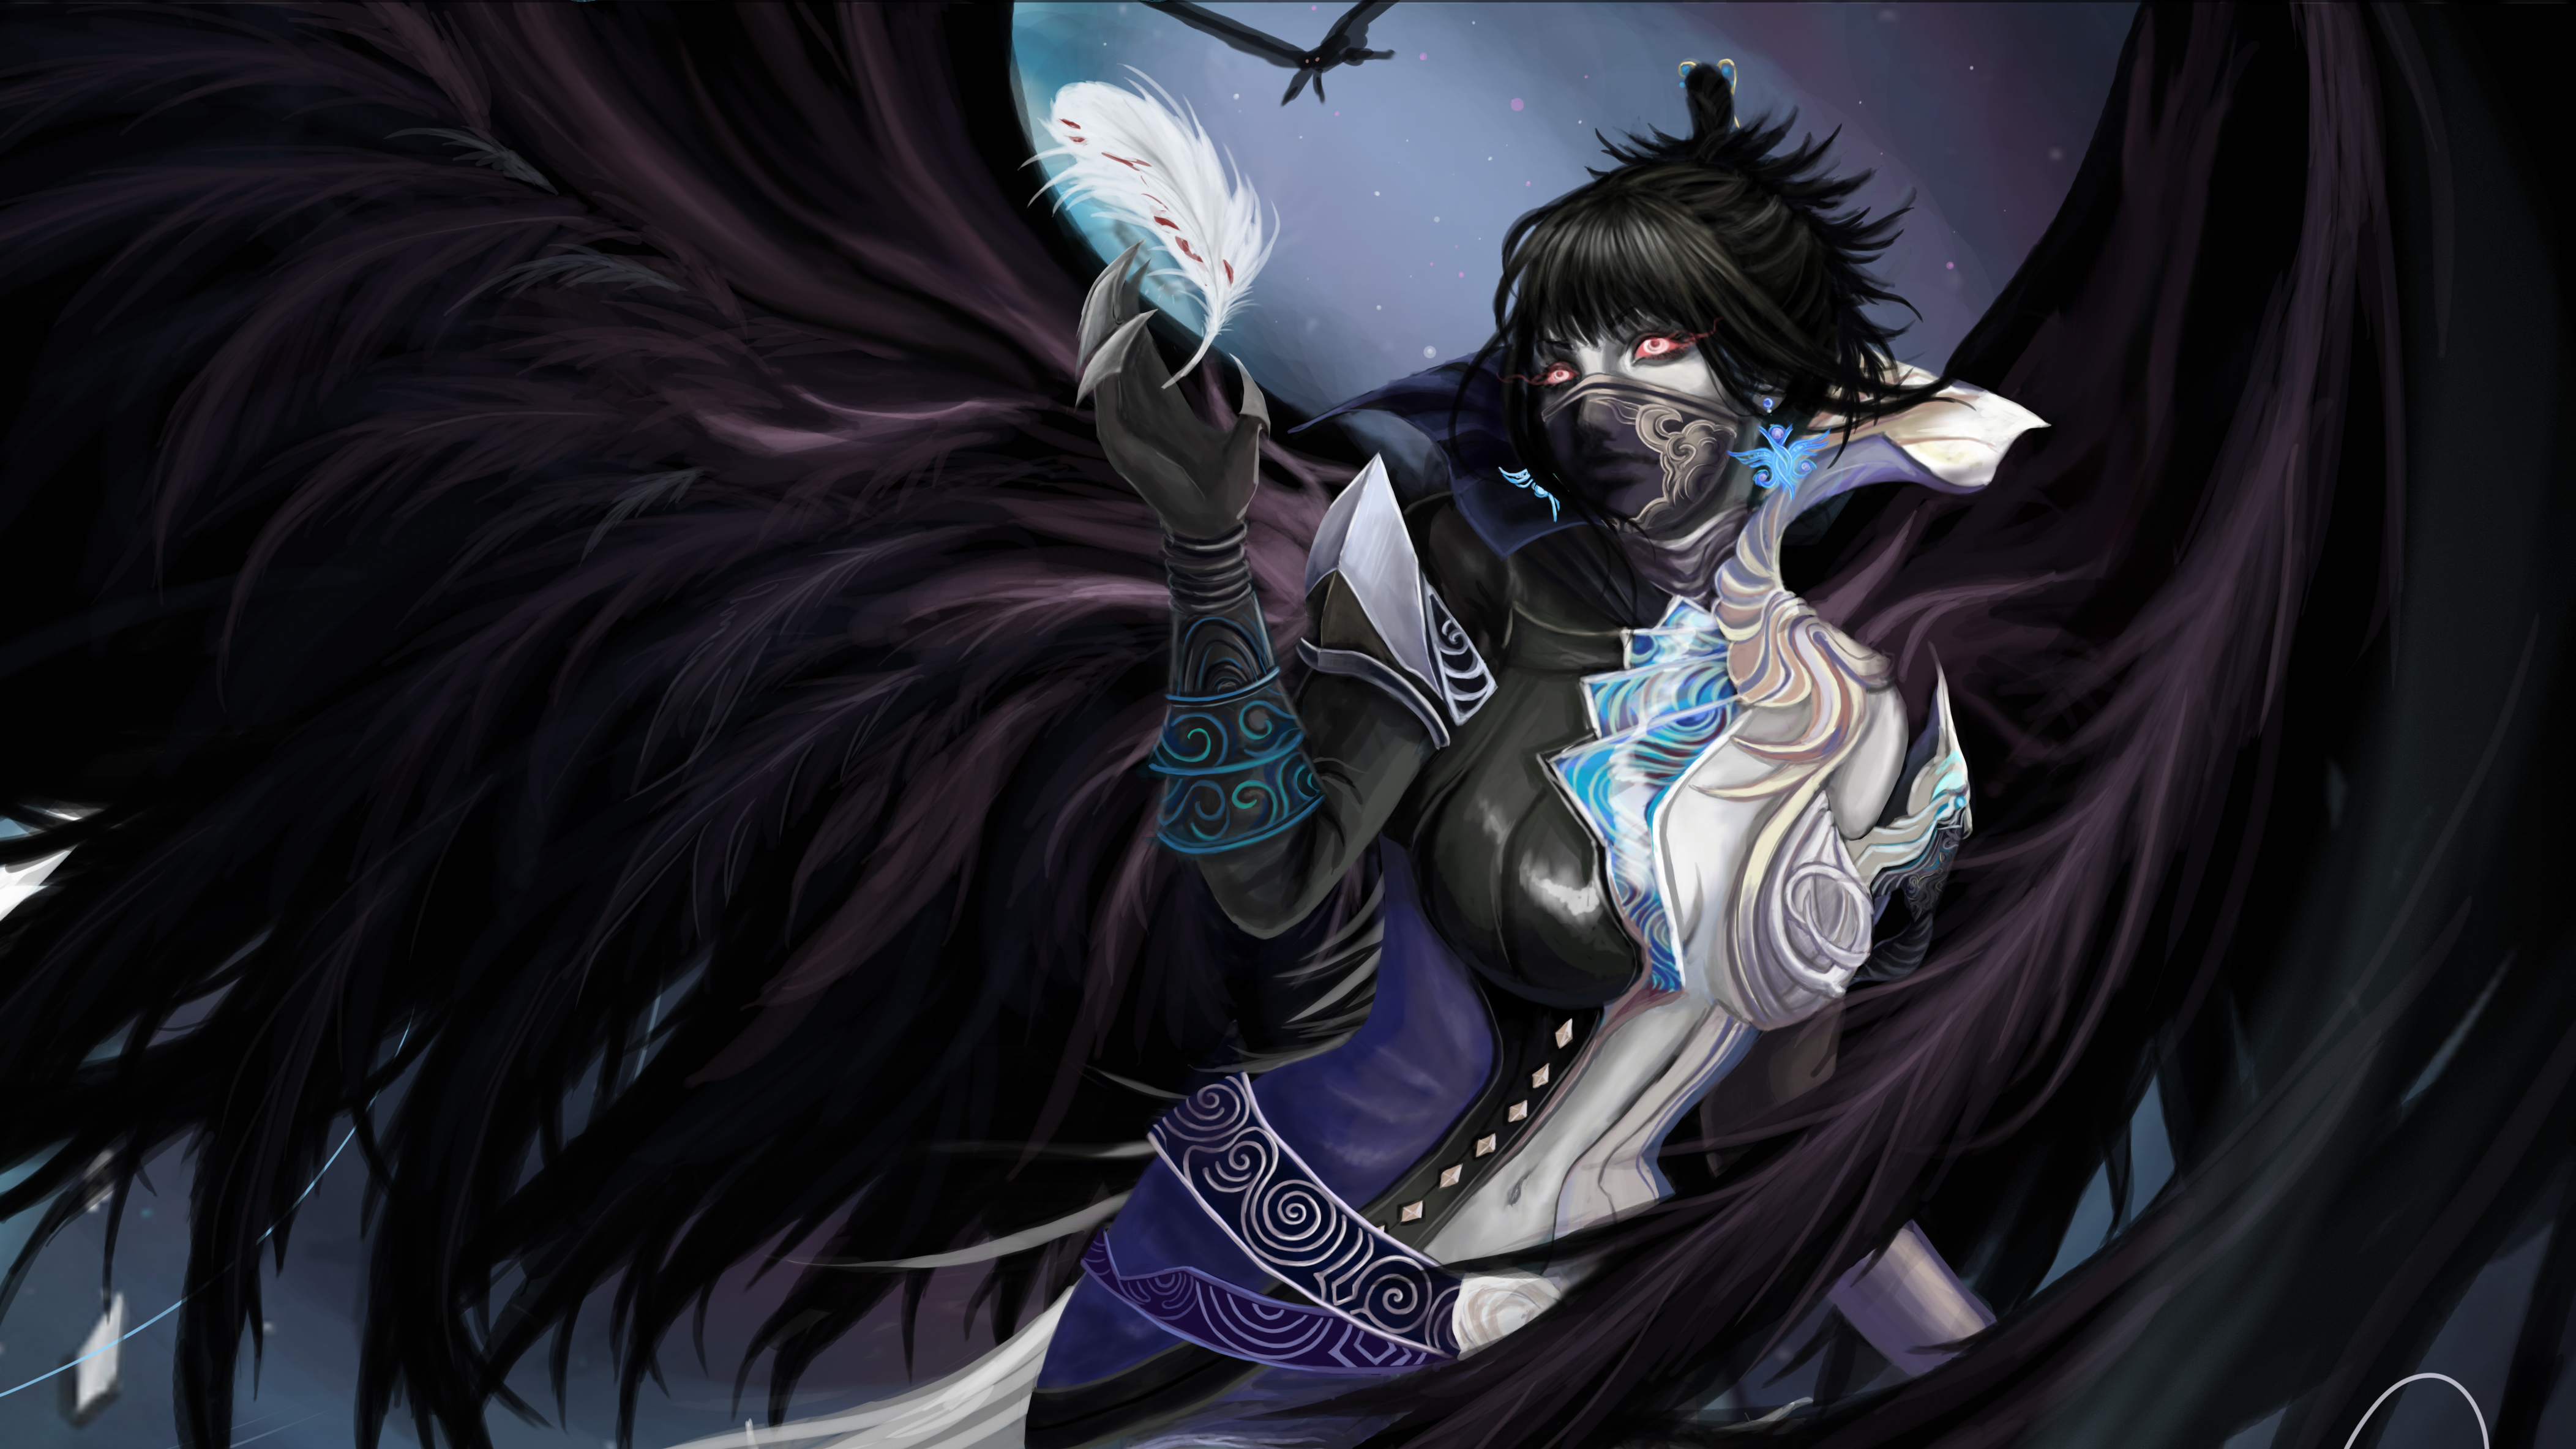 Gothic fantasy angel 4k ultra hd wallpaper background - Gothic angel wallpaper ...